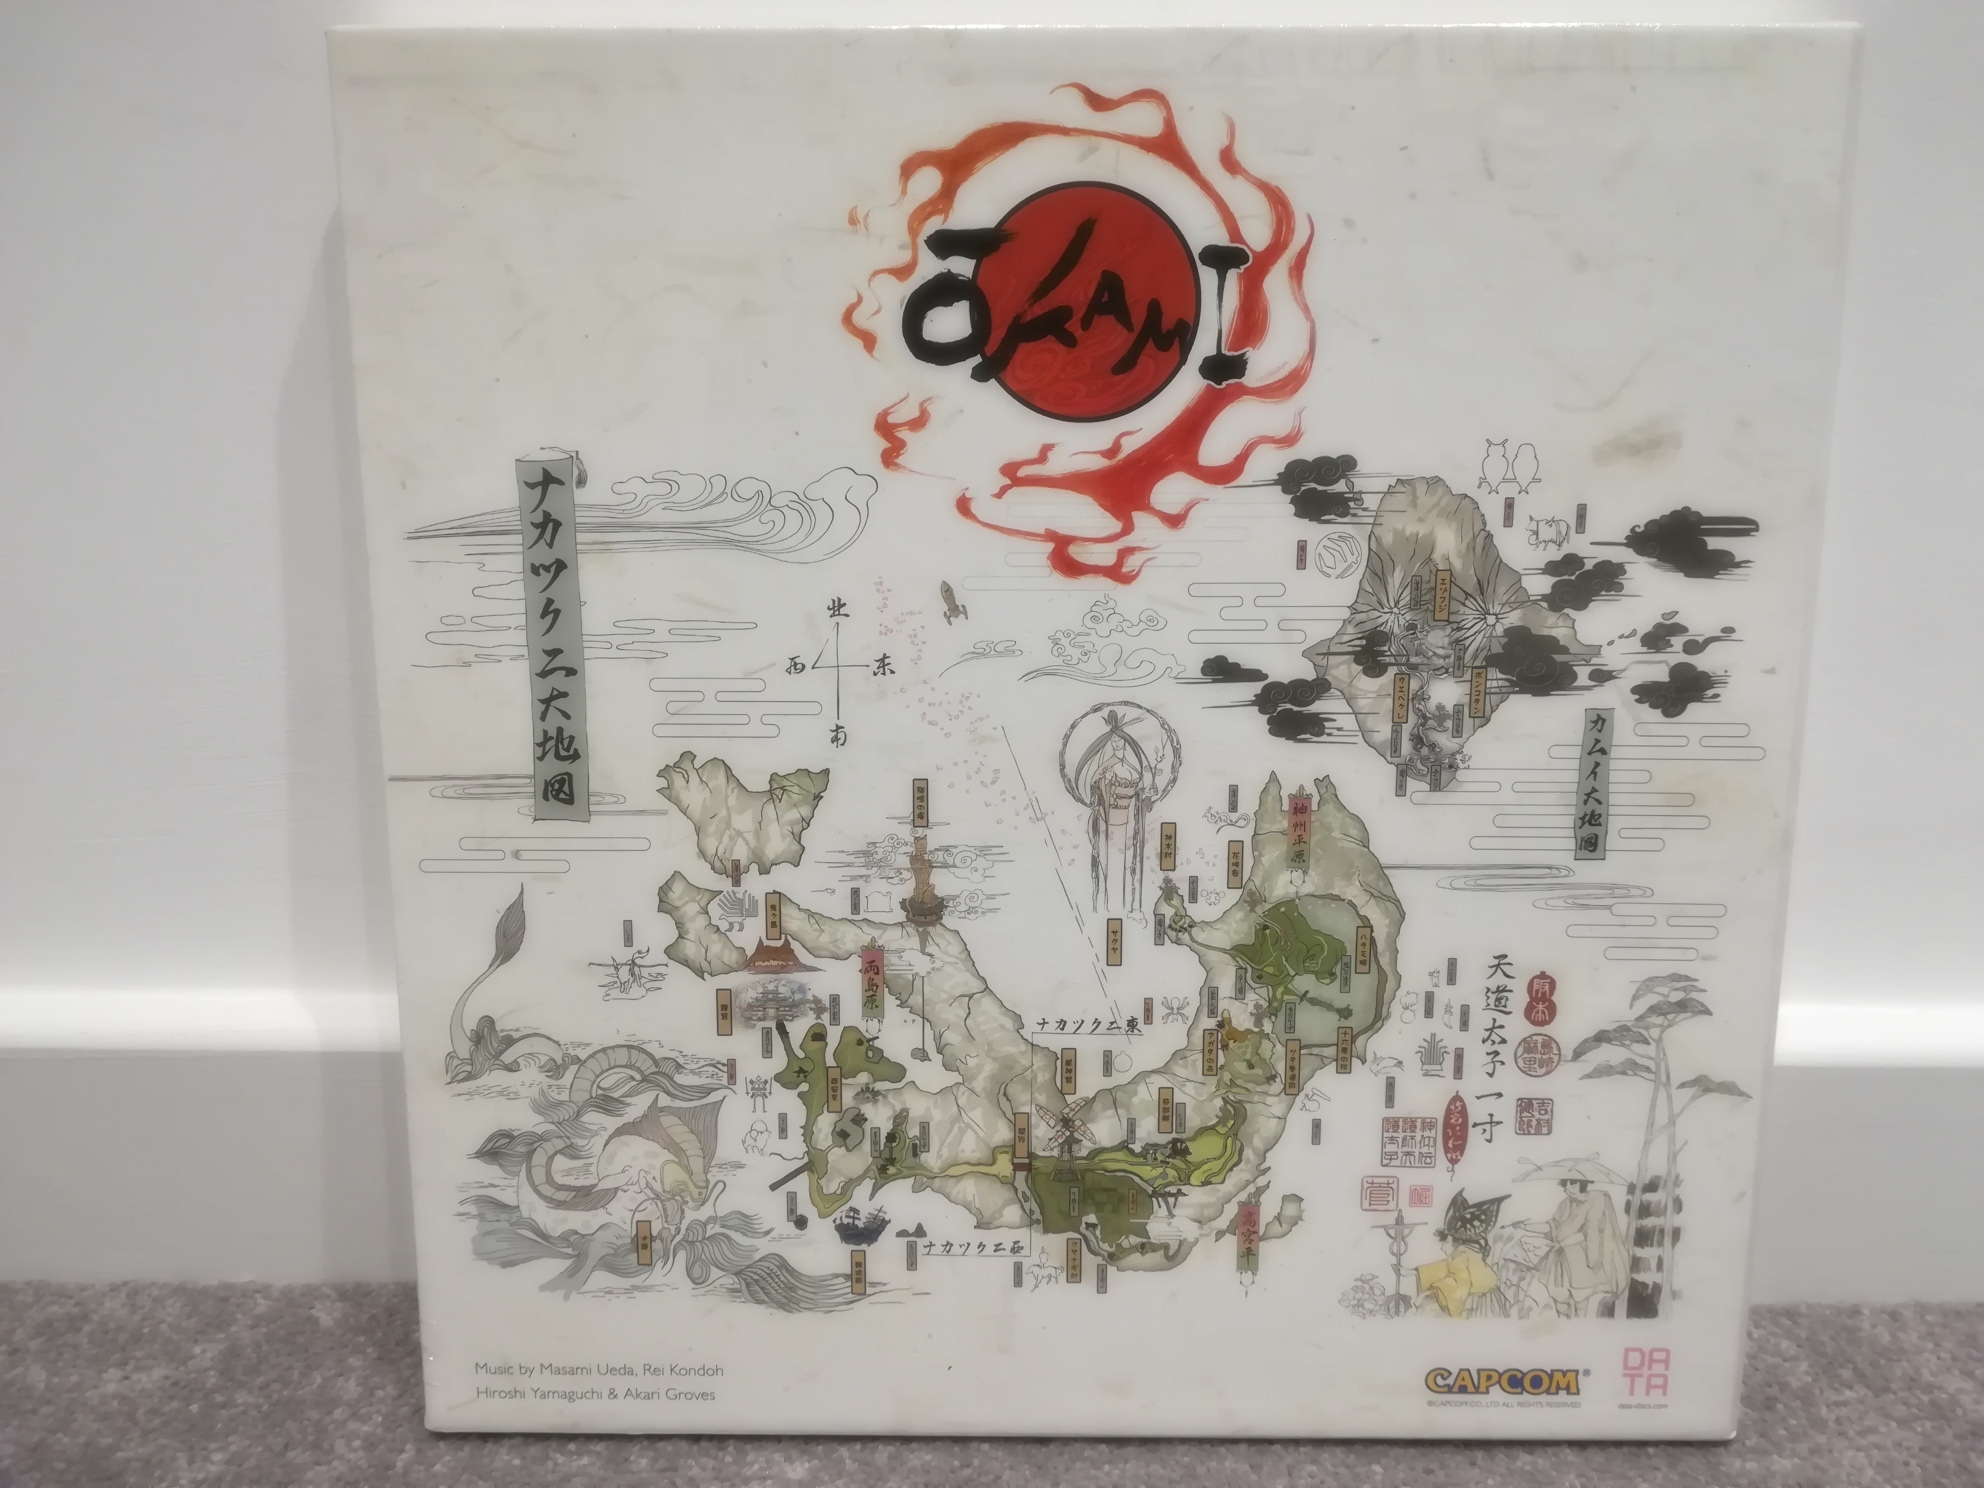 Okami Soundtrack on Vinyl